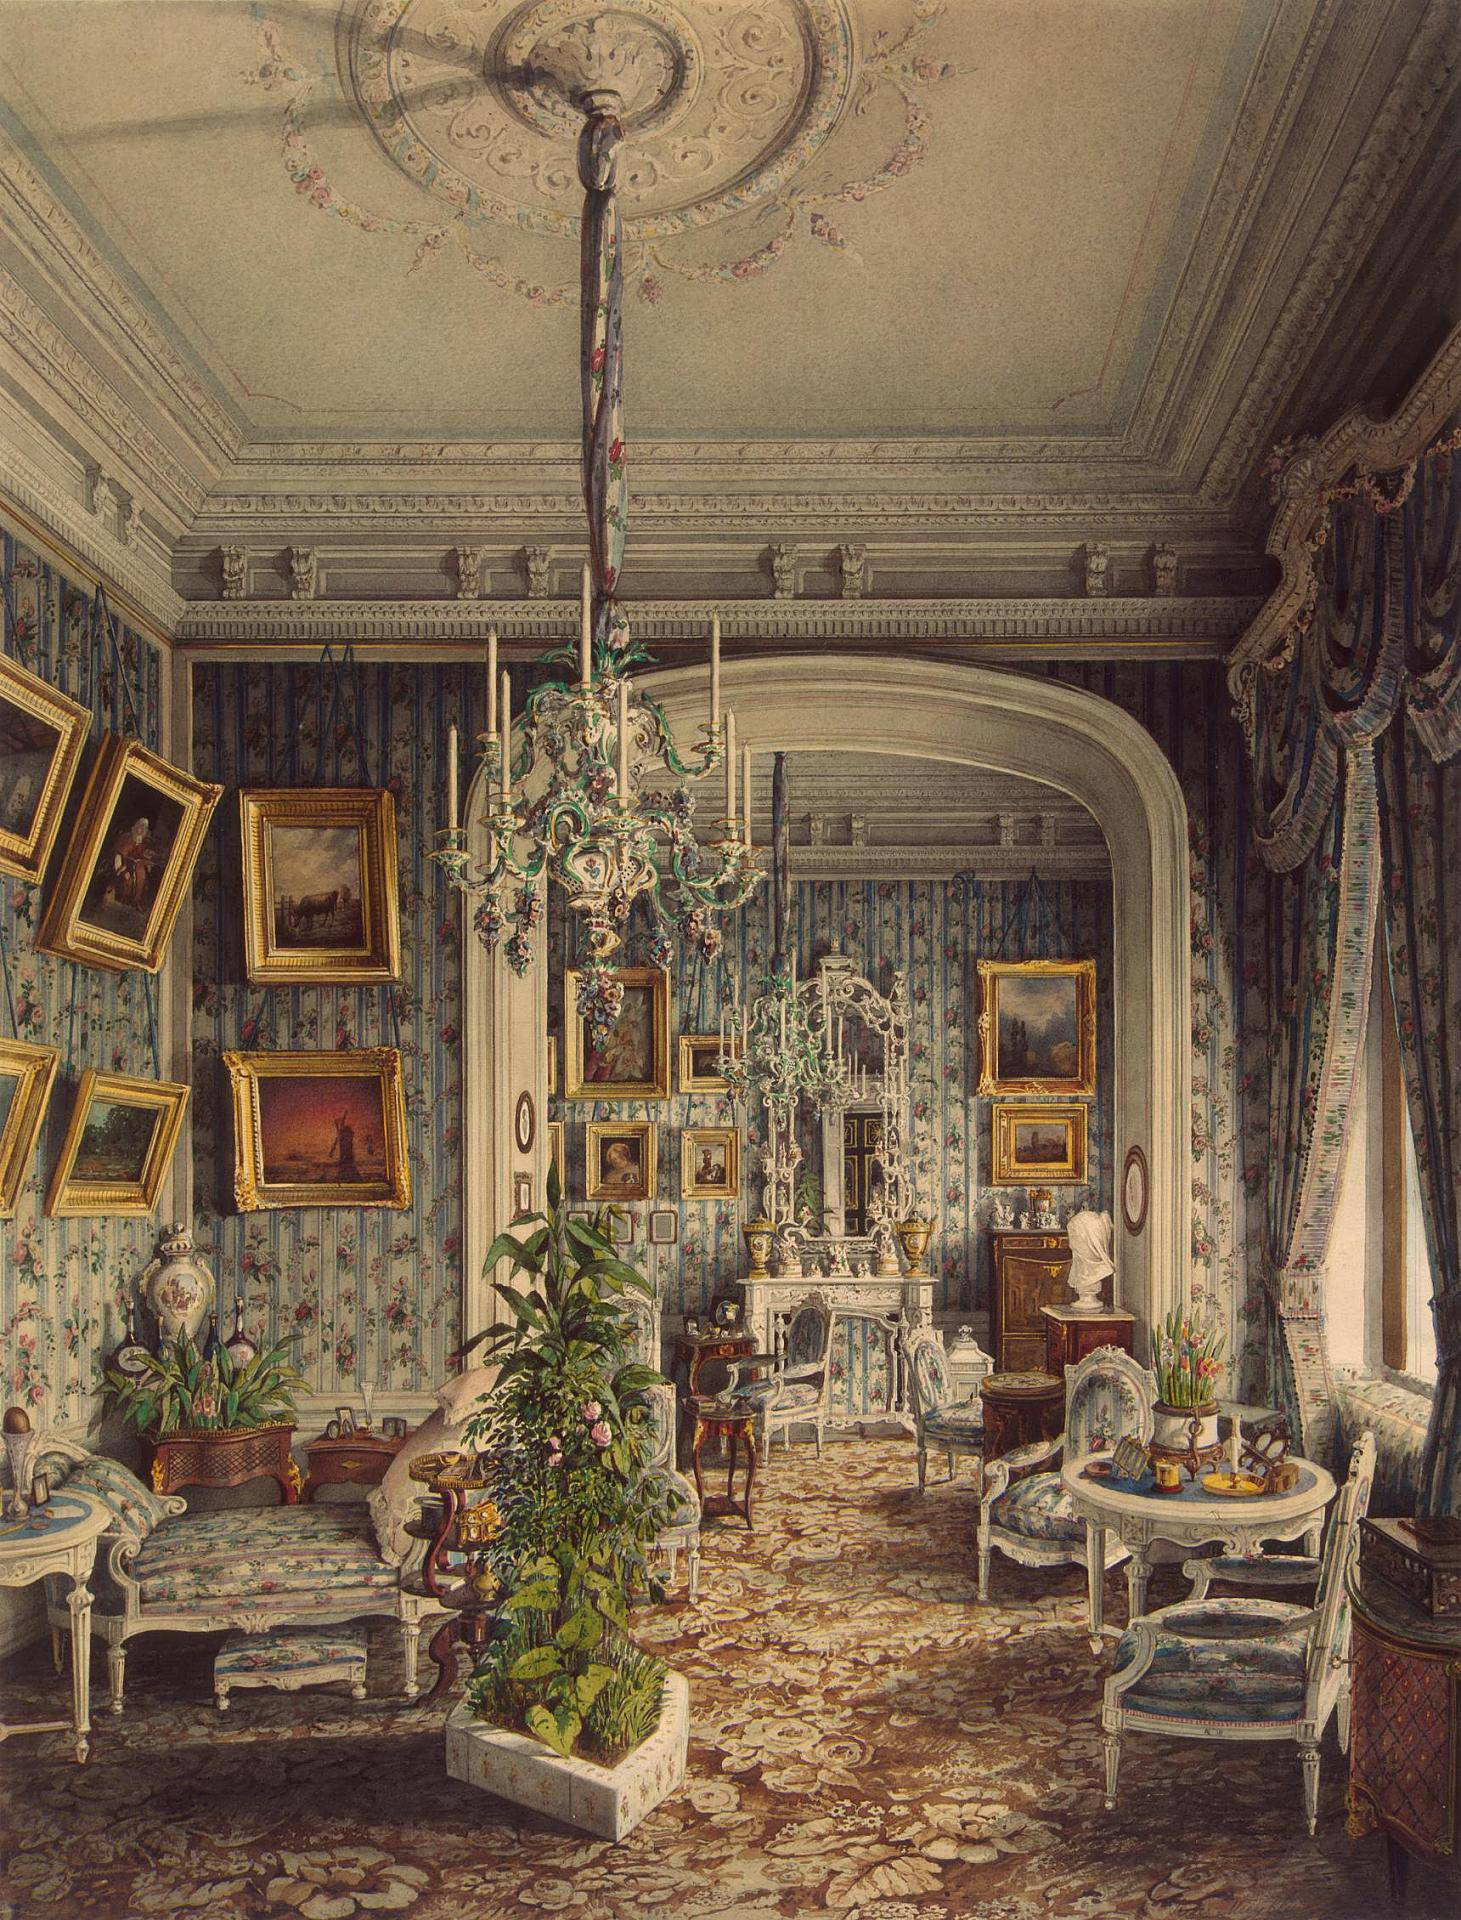 Санкт-Петербург, Строгановский дворец, 1865 год. Художник Jules Mayblum